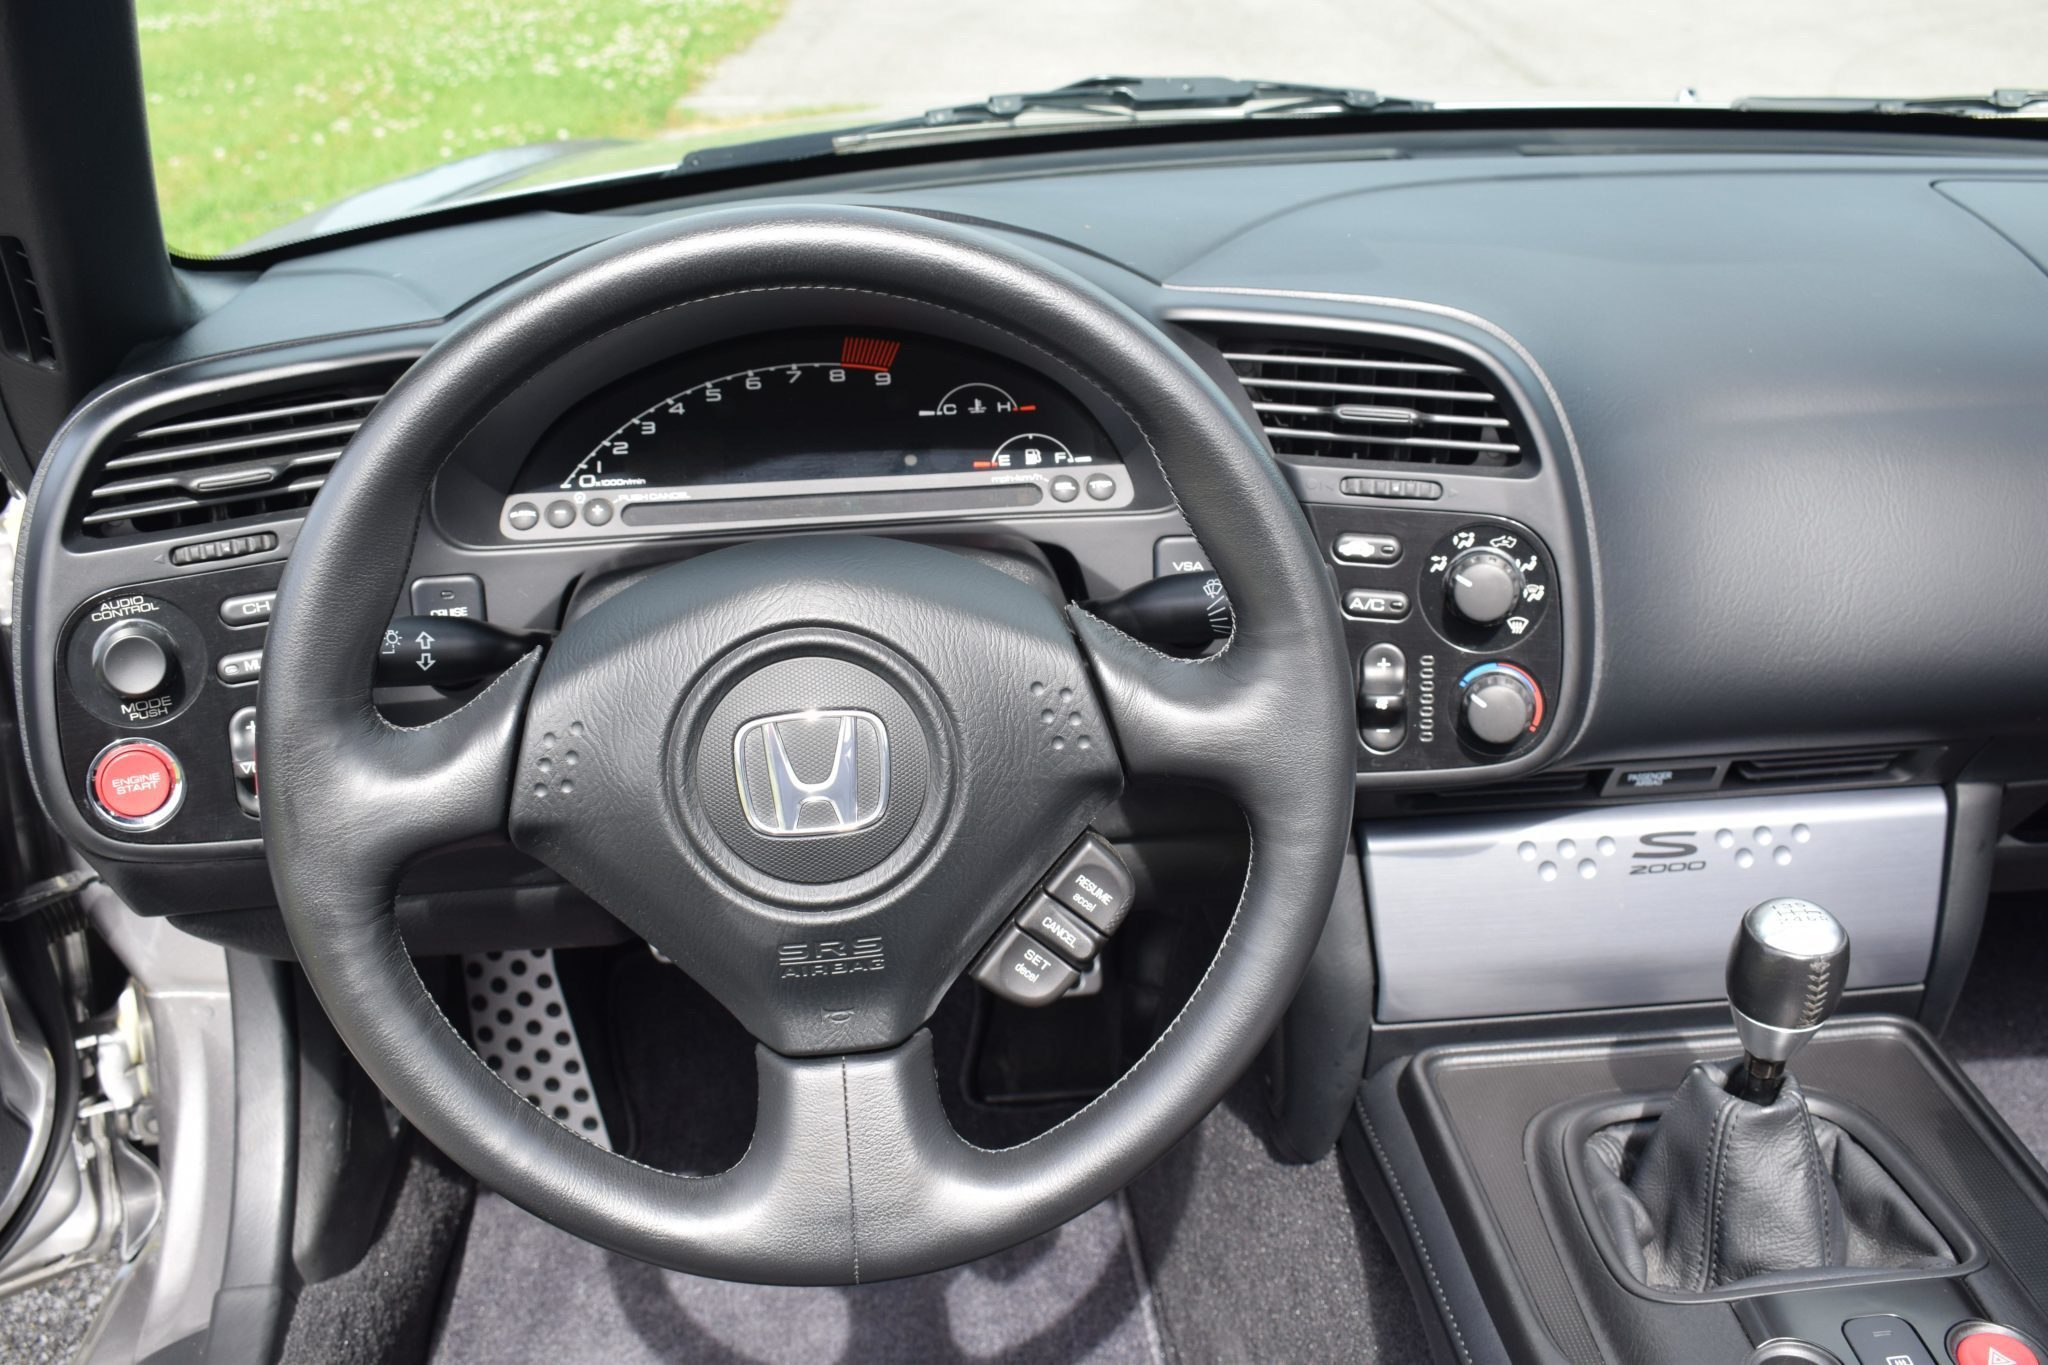 2007_Honda_S2000_sale_0011